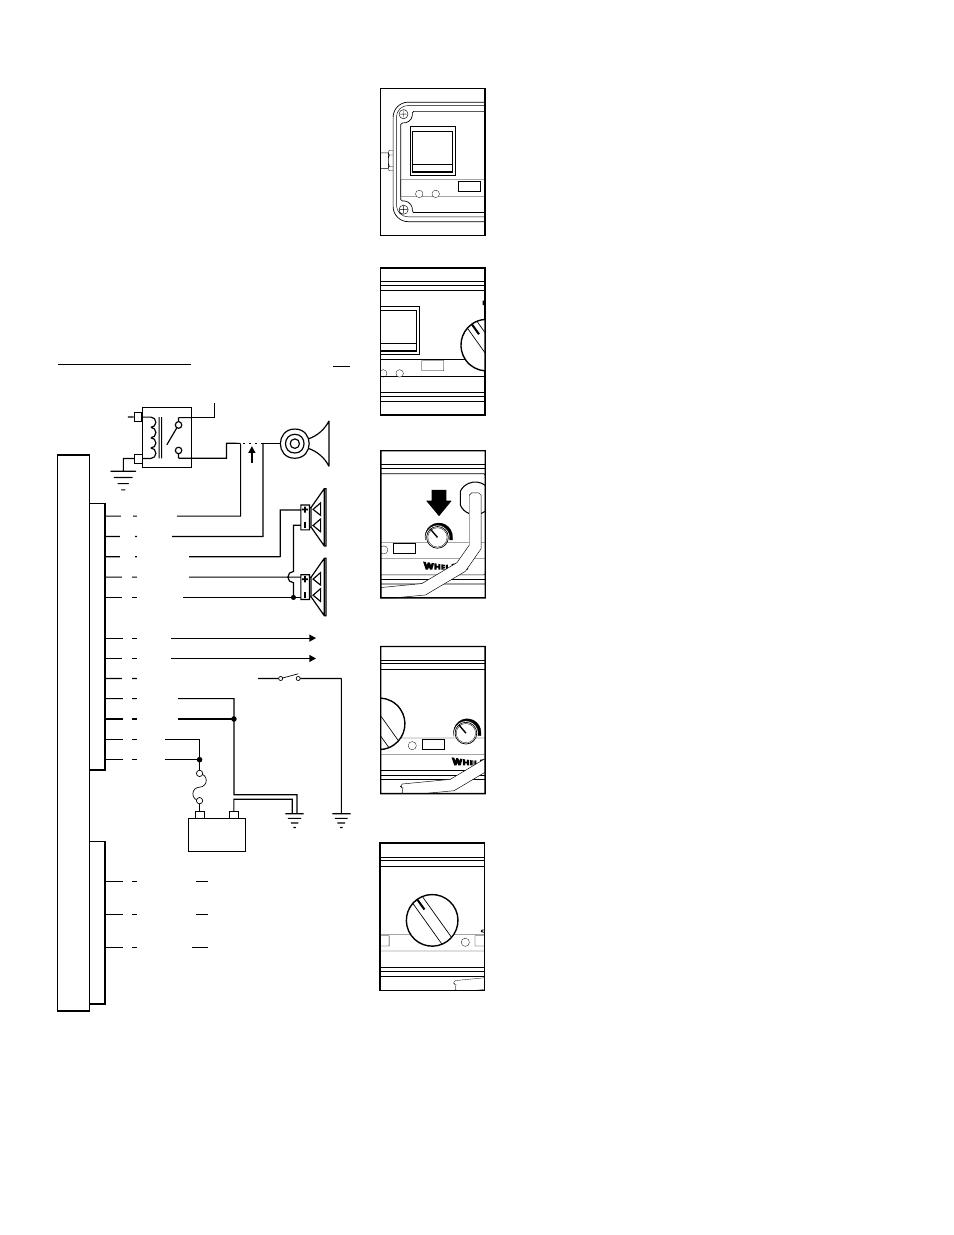 [TVPR_3874]  911ep Wiring Diagram - H1 wiring diagram | Light Bar 911ep Galaxy Wiring Diagram |  | standaardportaal.nl